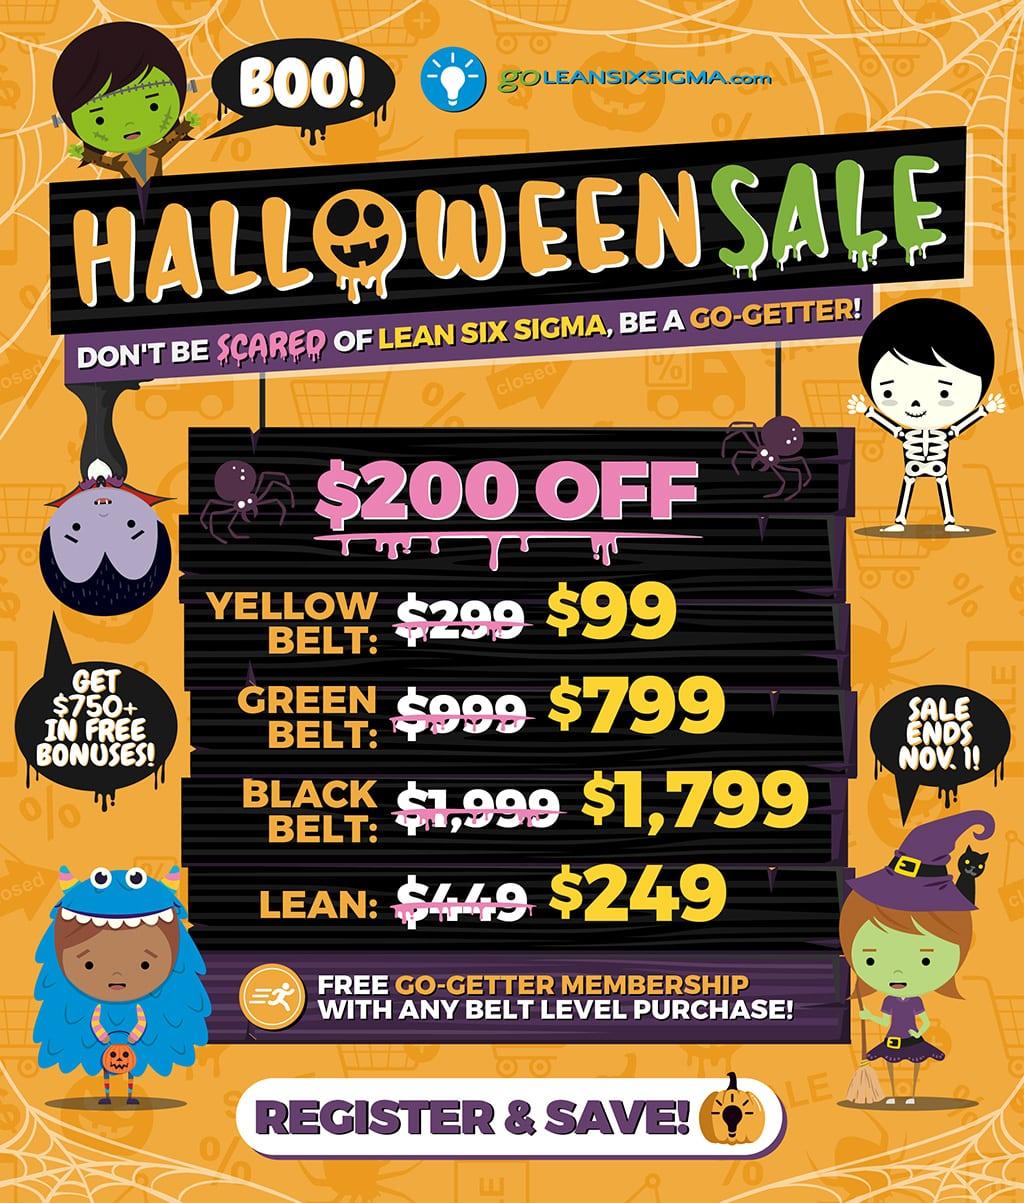 Halloween-sale-2019